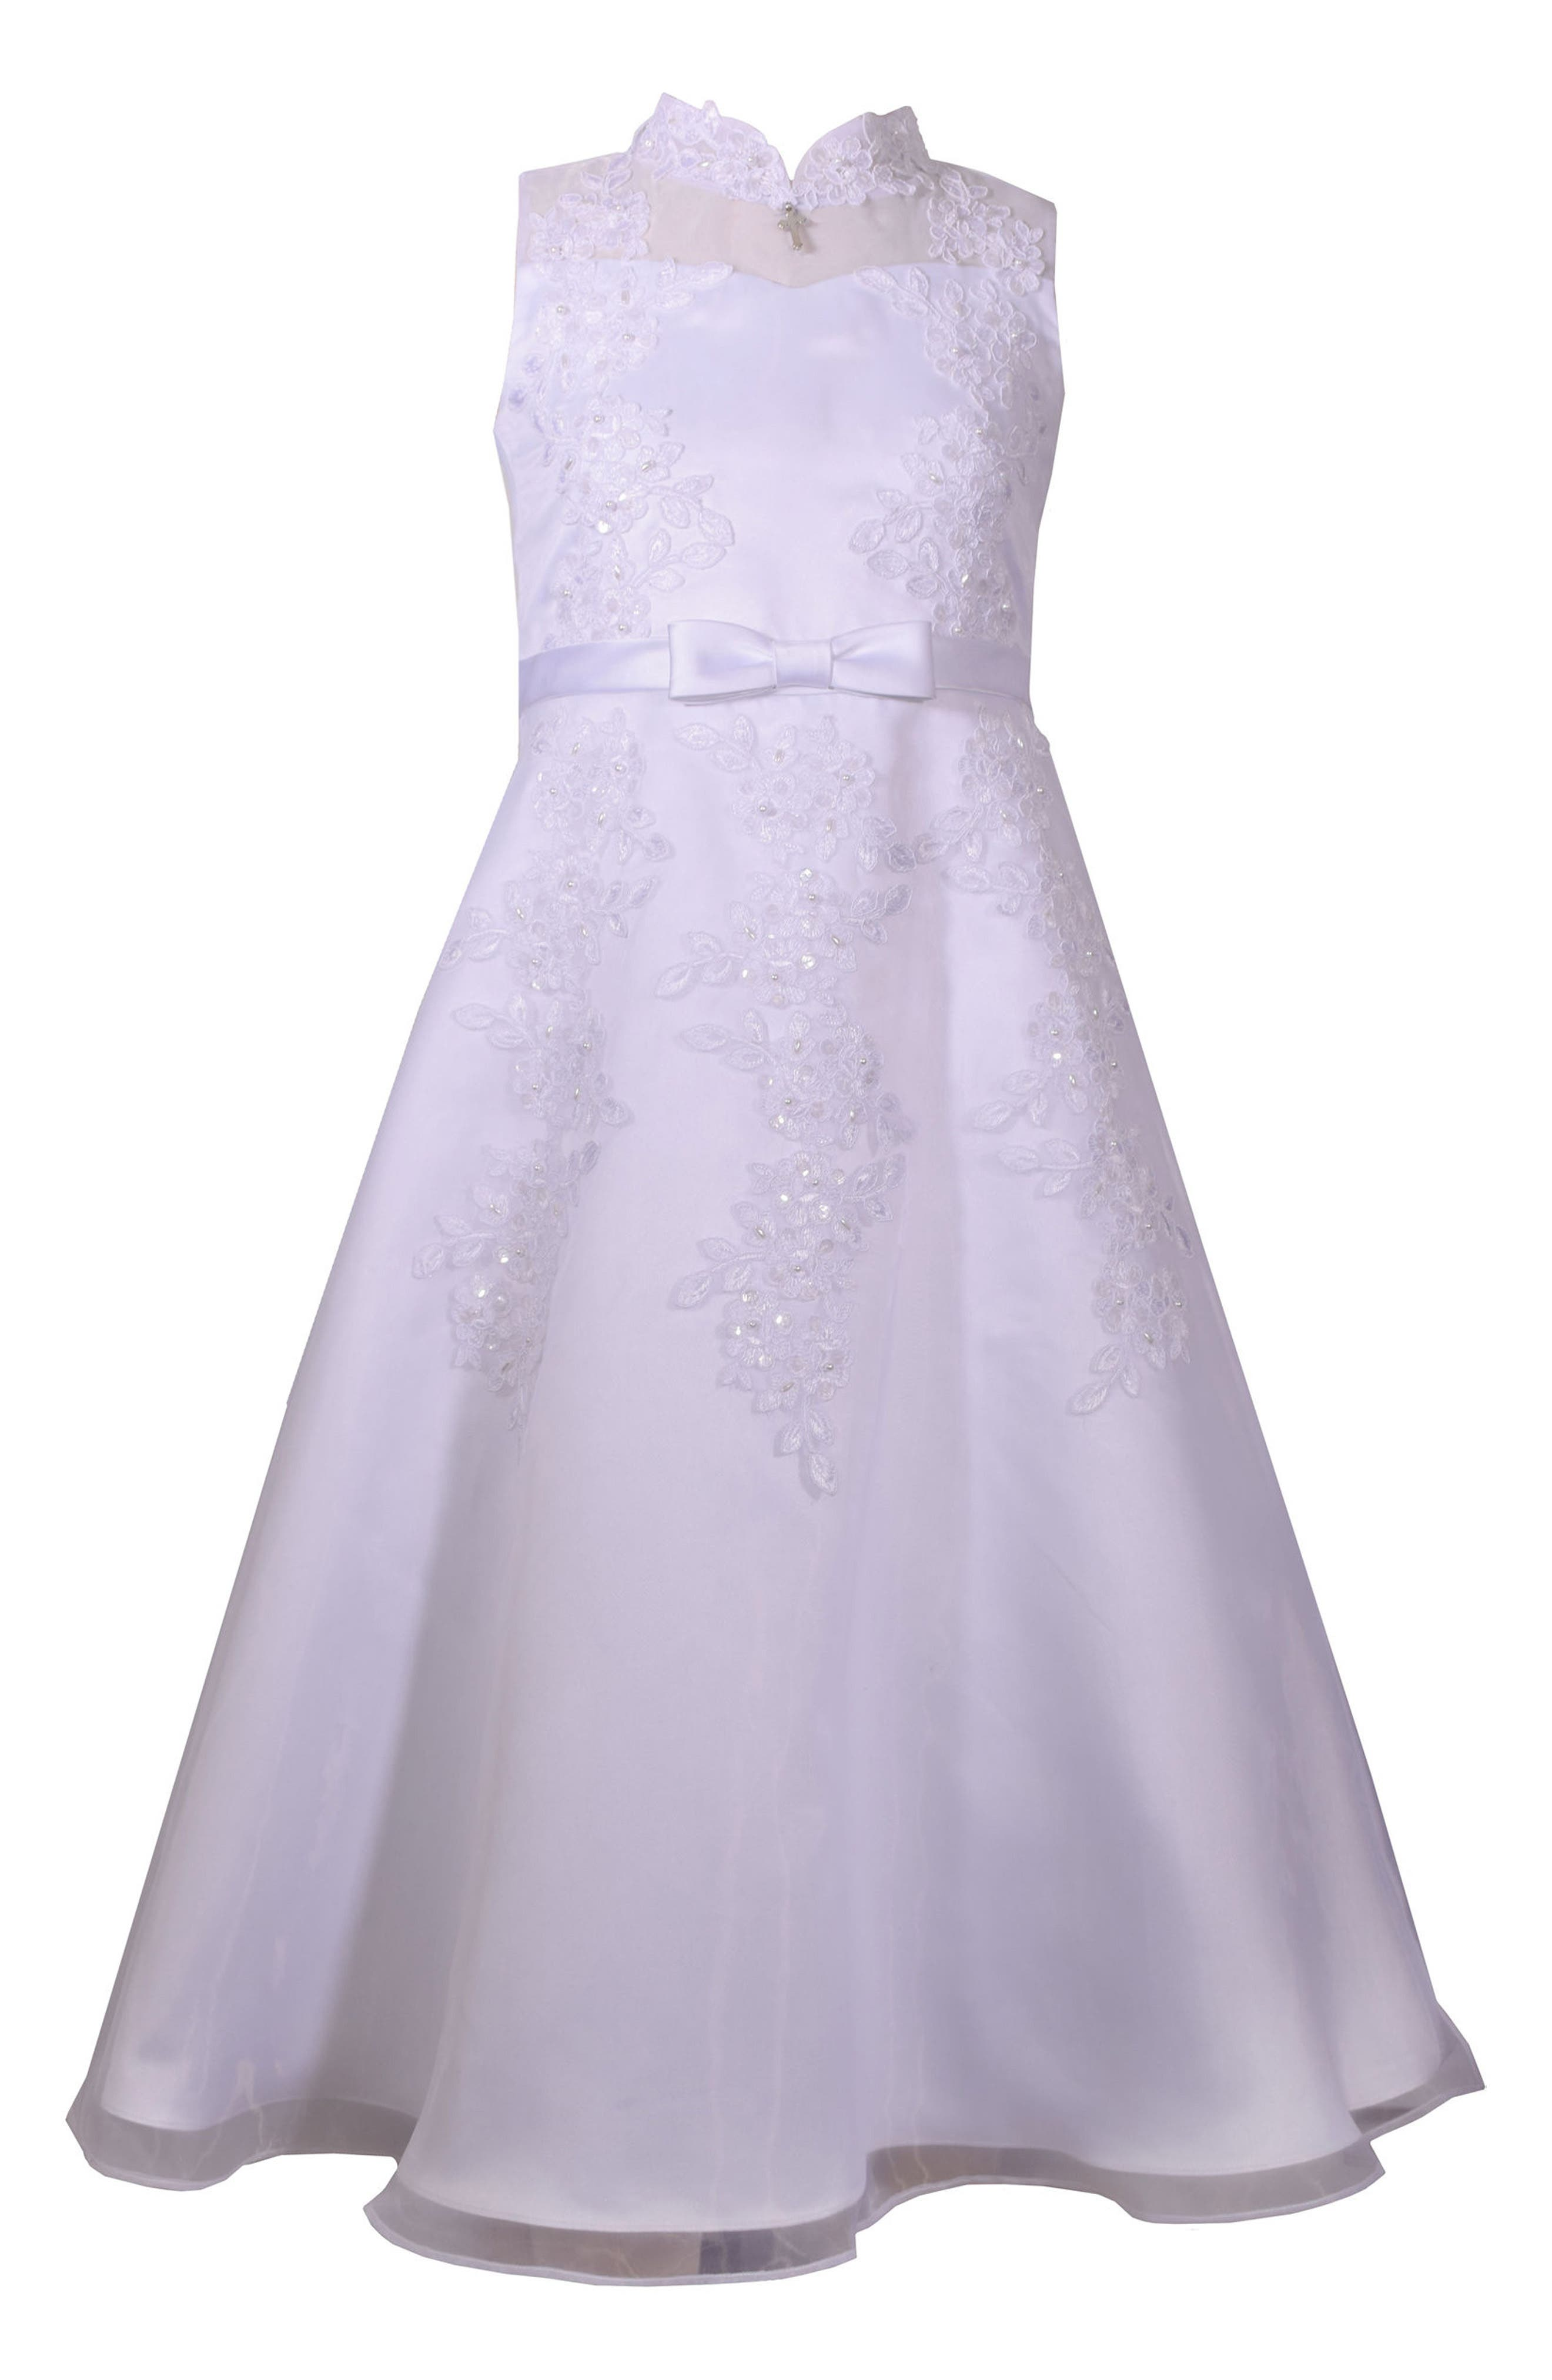 Sequin First Communion Dress,                             Main thumbnail 1, color,                             White